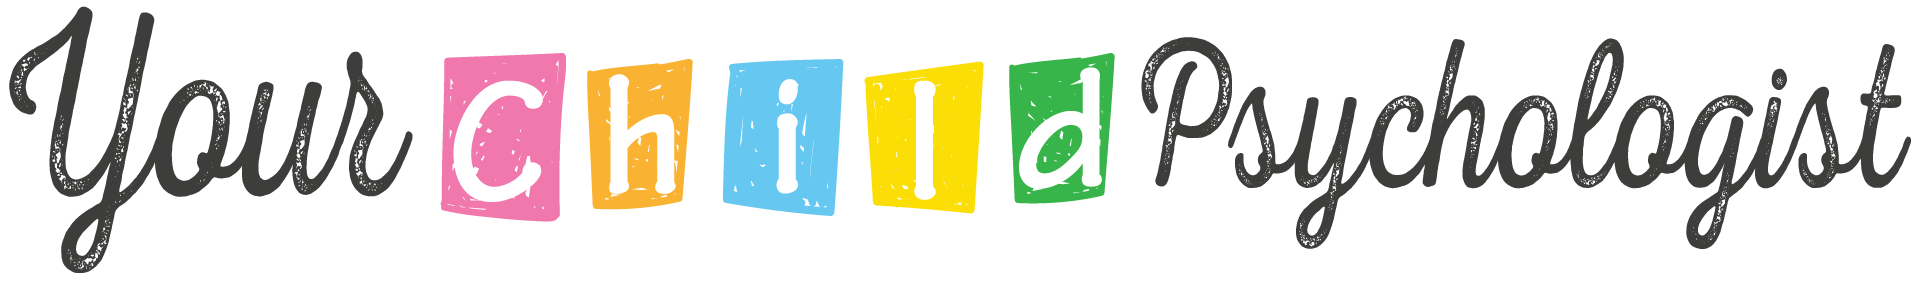 Steph-Doig-Logo-No-Children.png